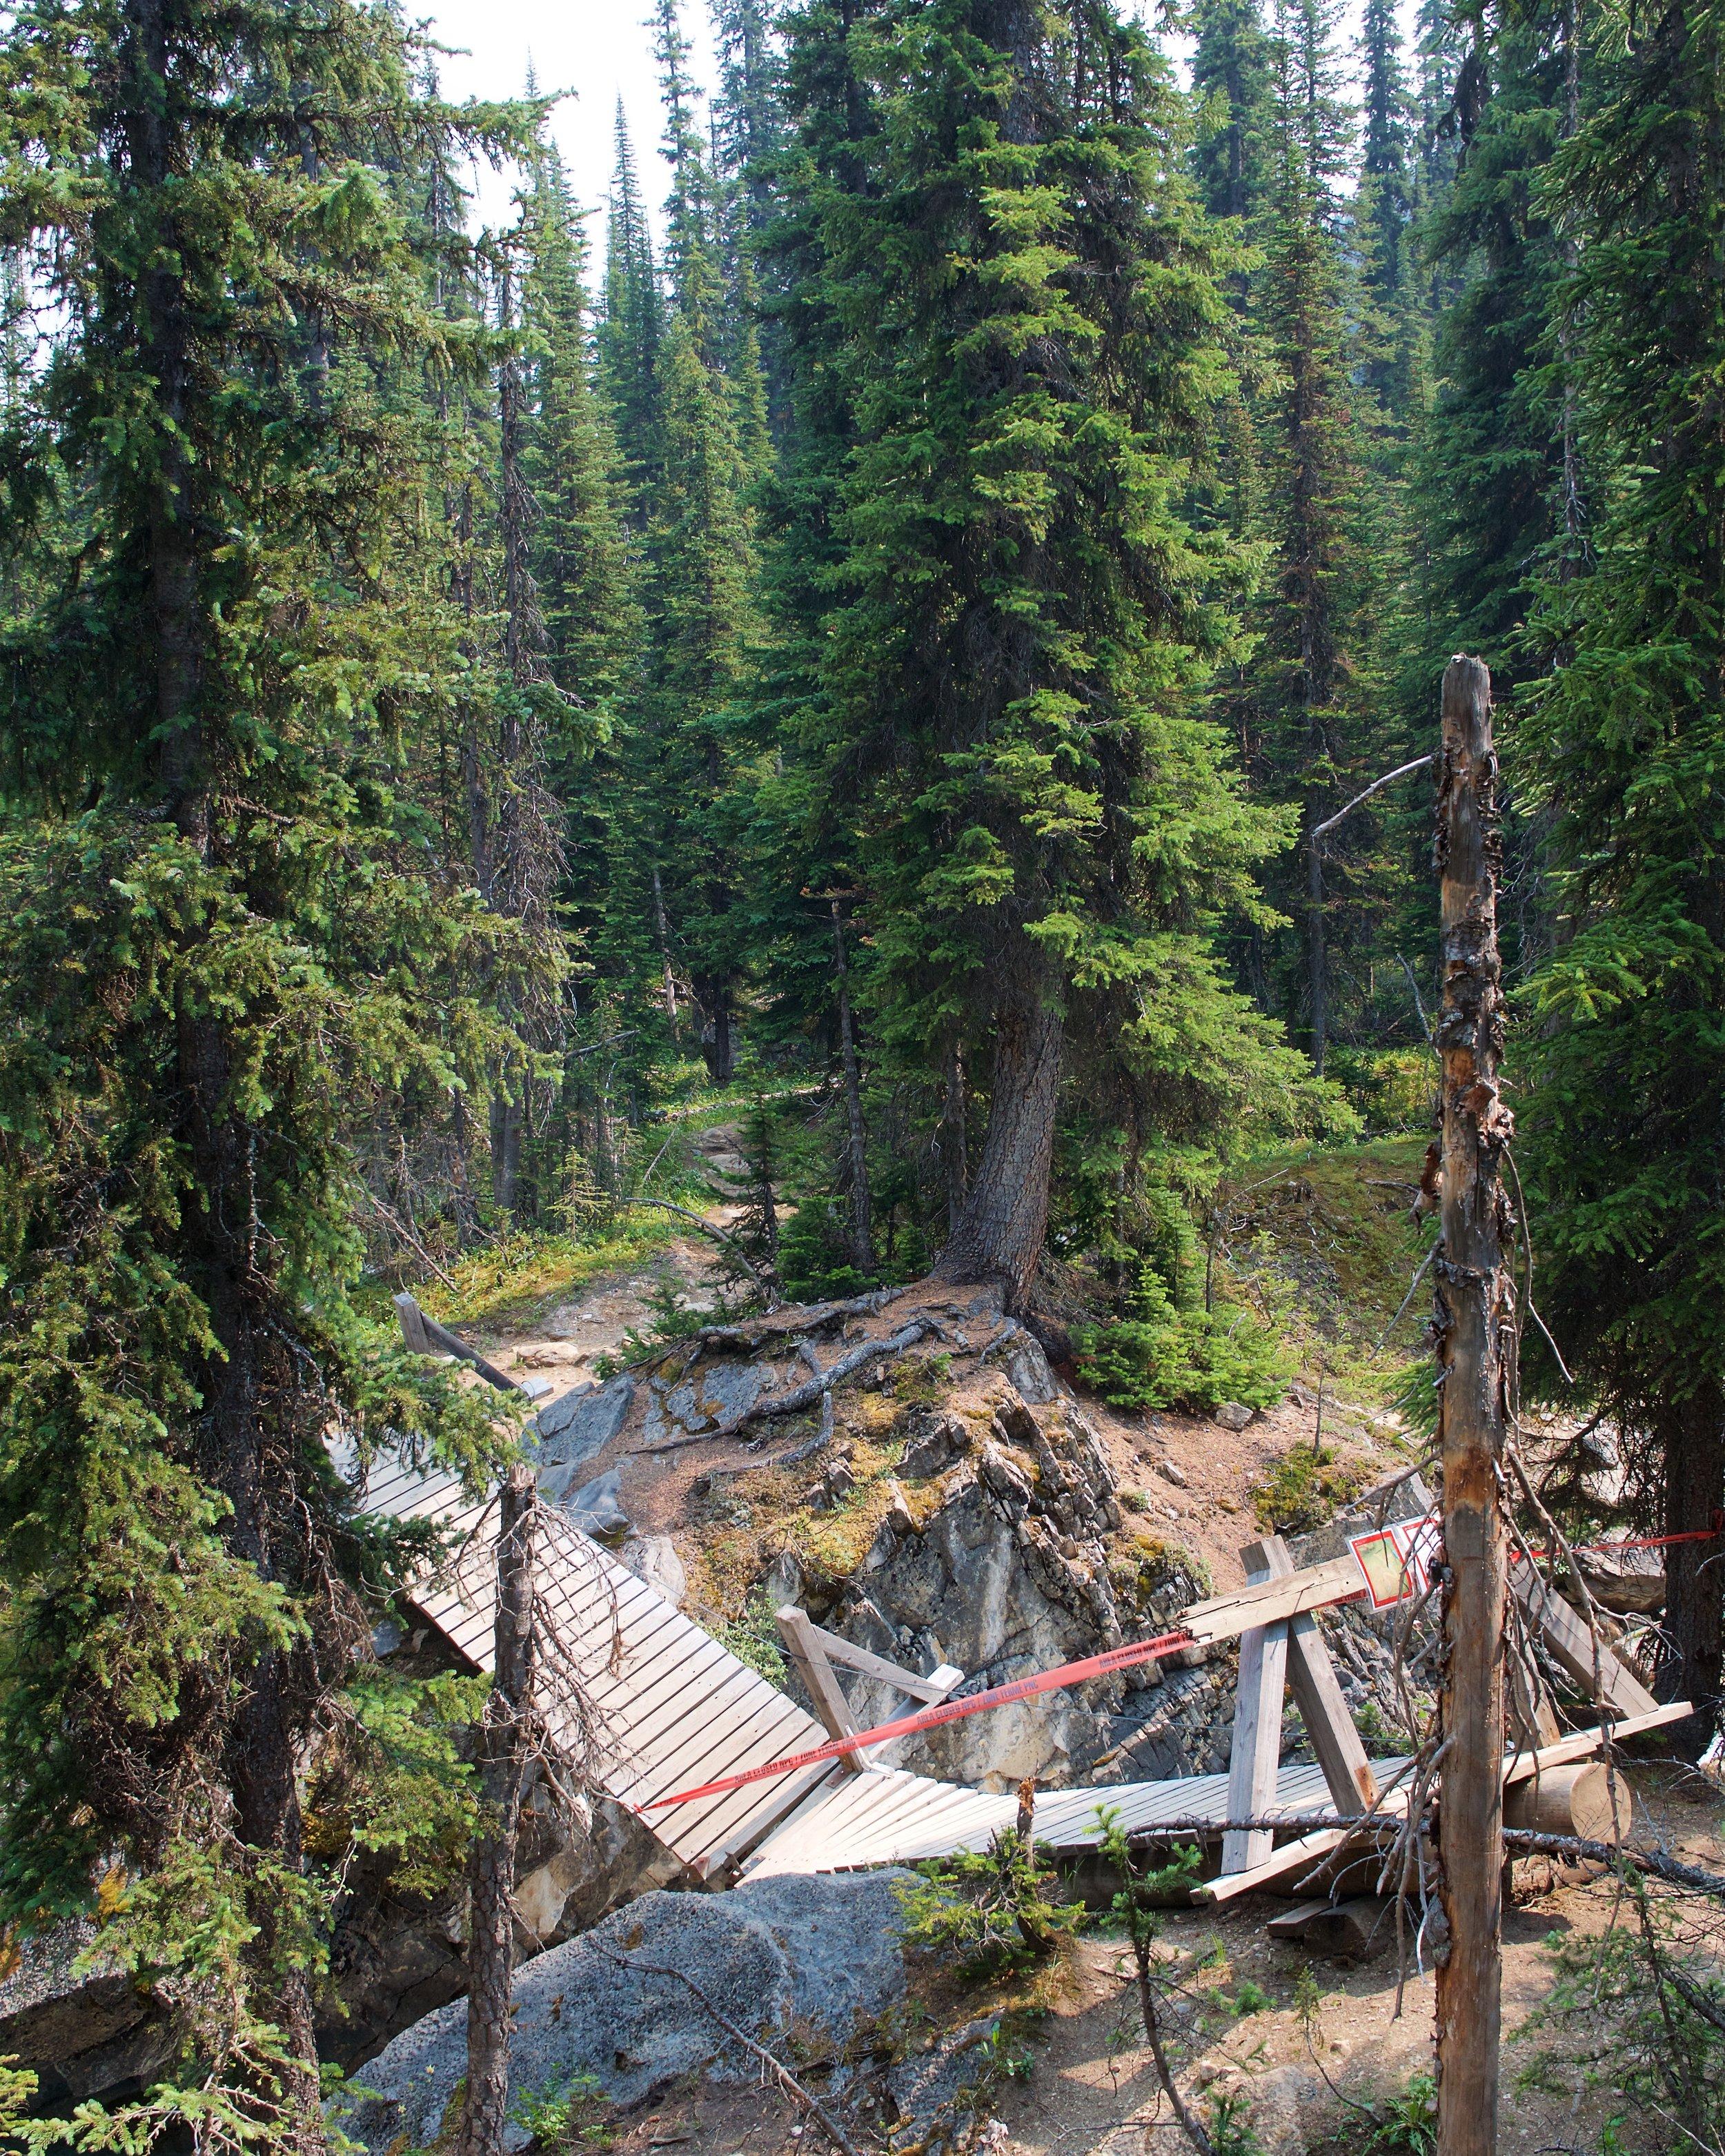 Celeste Bridge, washed out